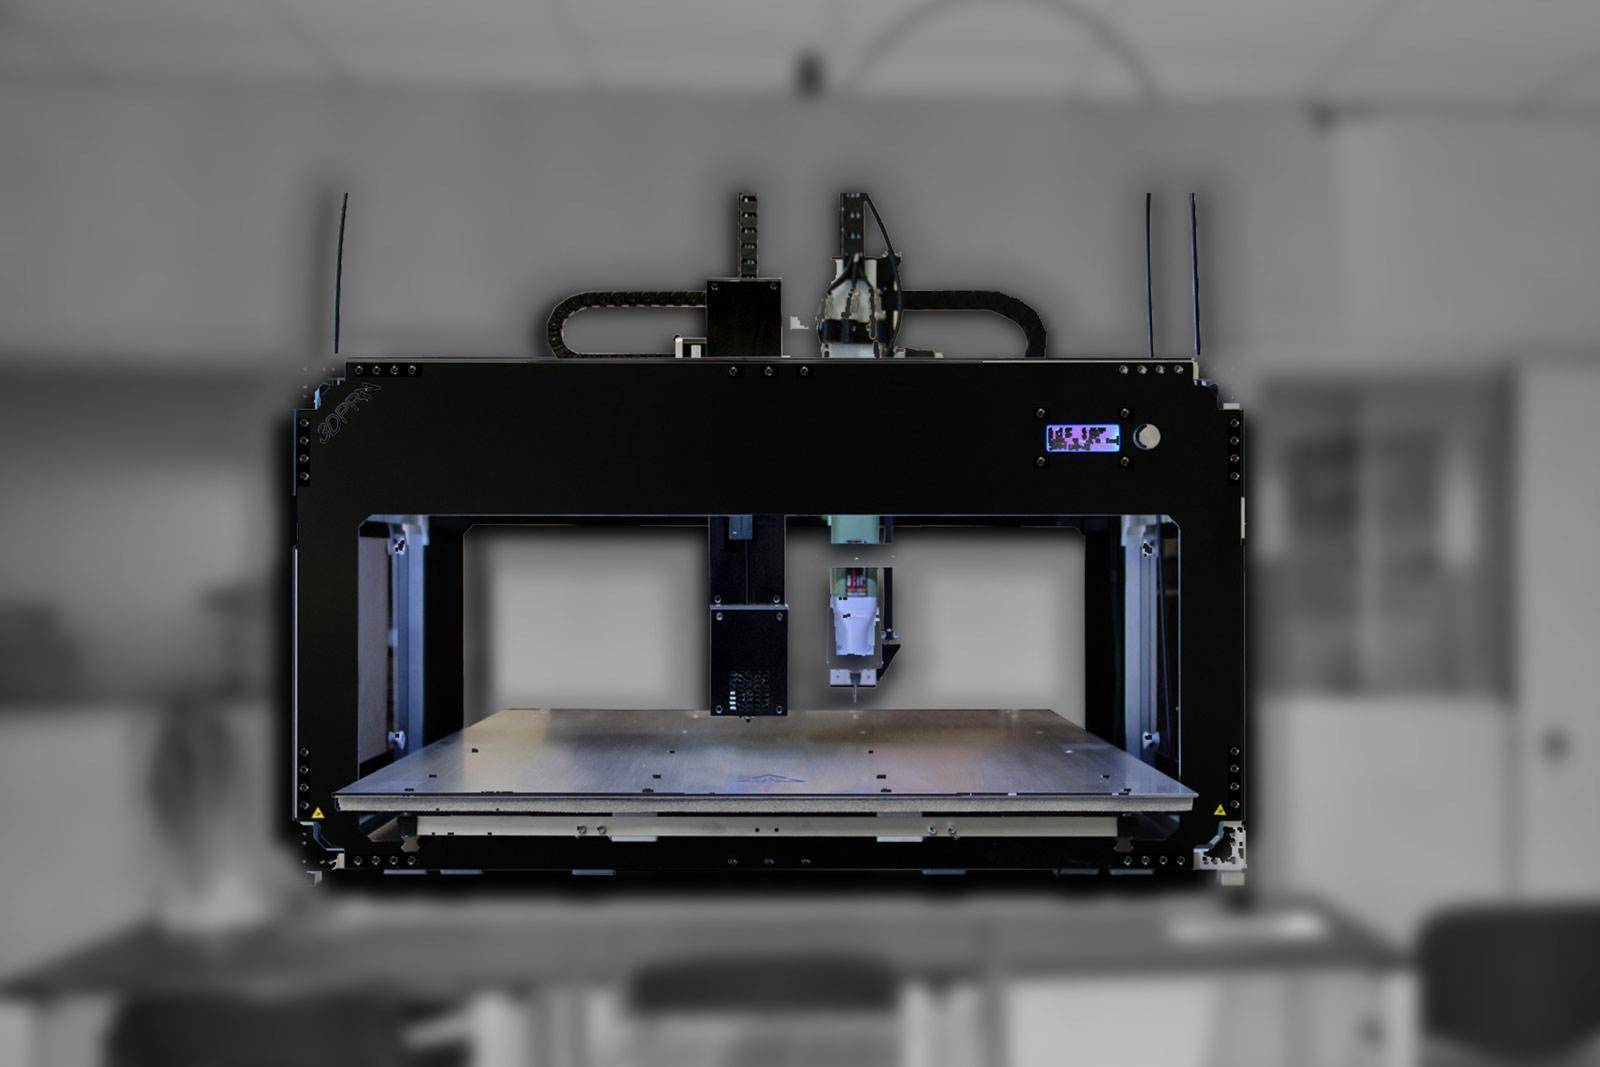 stampante professionale 3D tips x2 mill 1 - Stampanti 3D Professionali